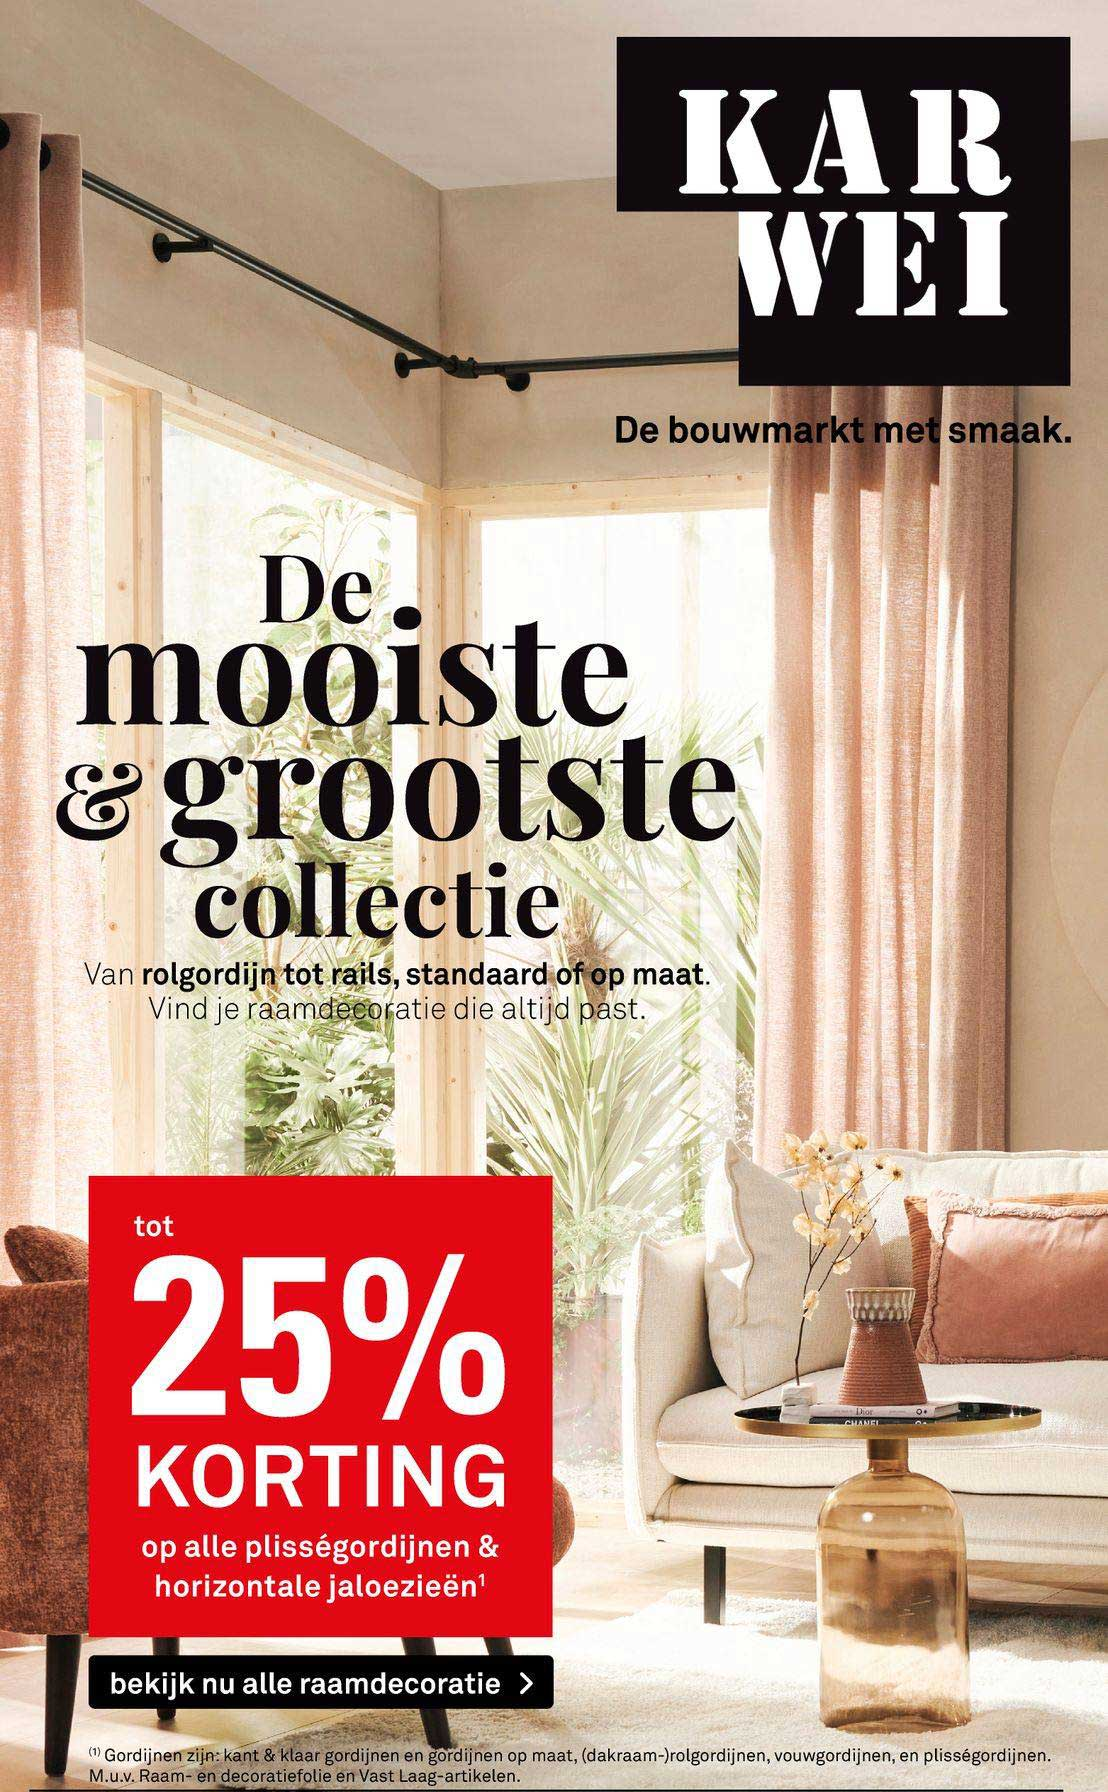 Karwei Op Alle Plisségordijnen & Horizontale Jaloezieën Tot 25% Korting